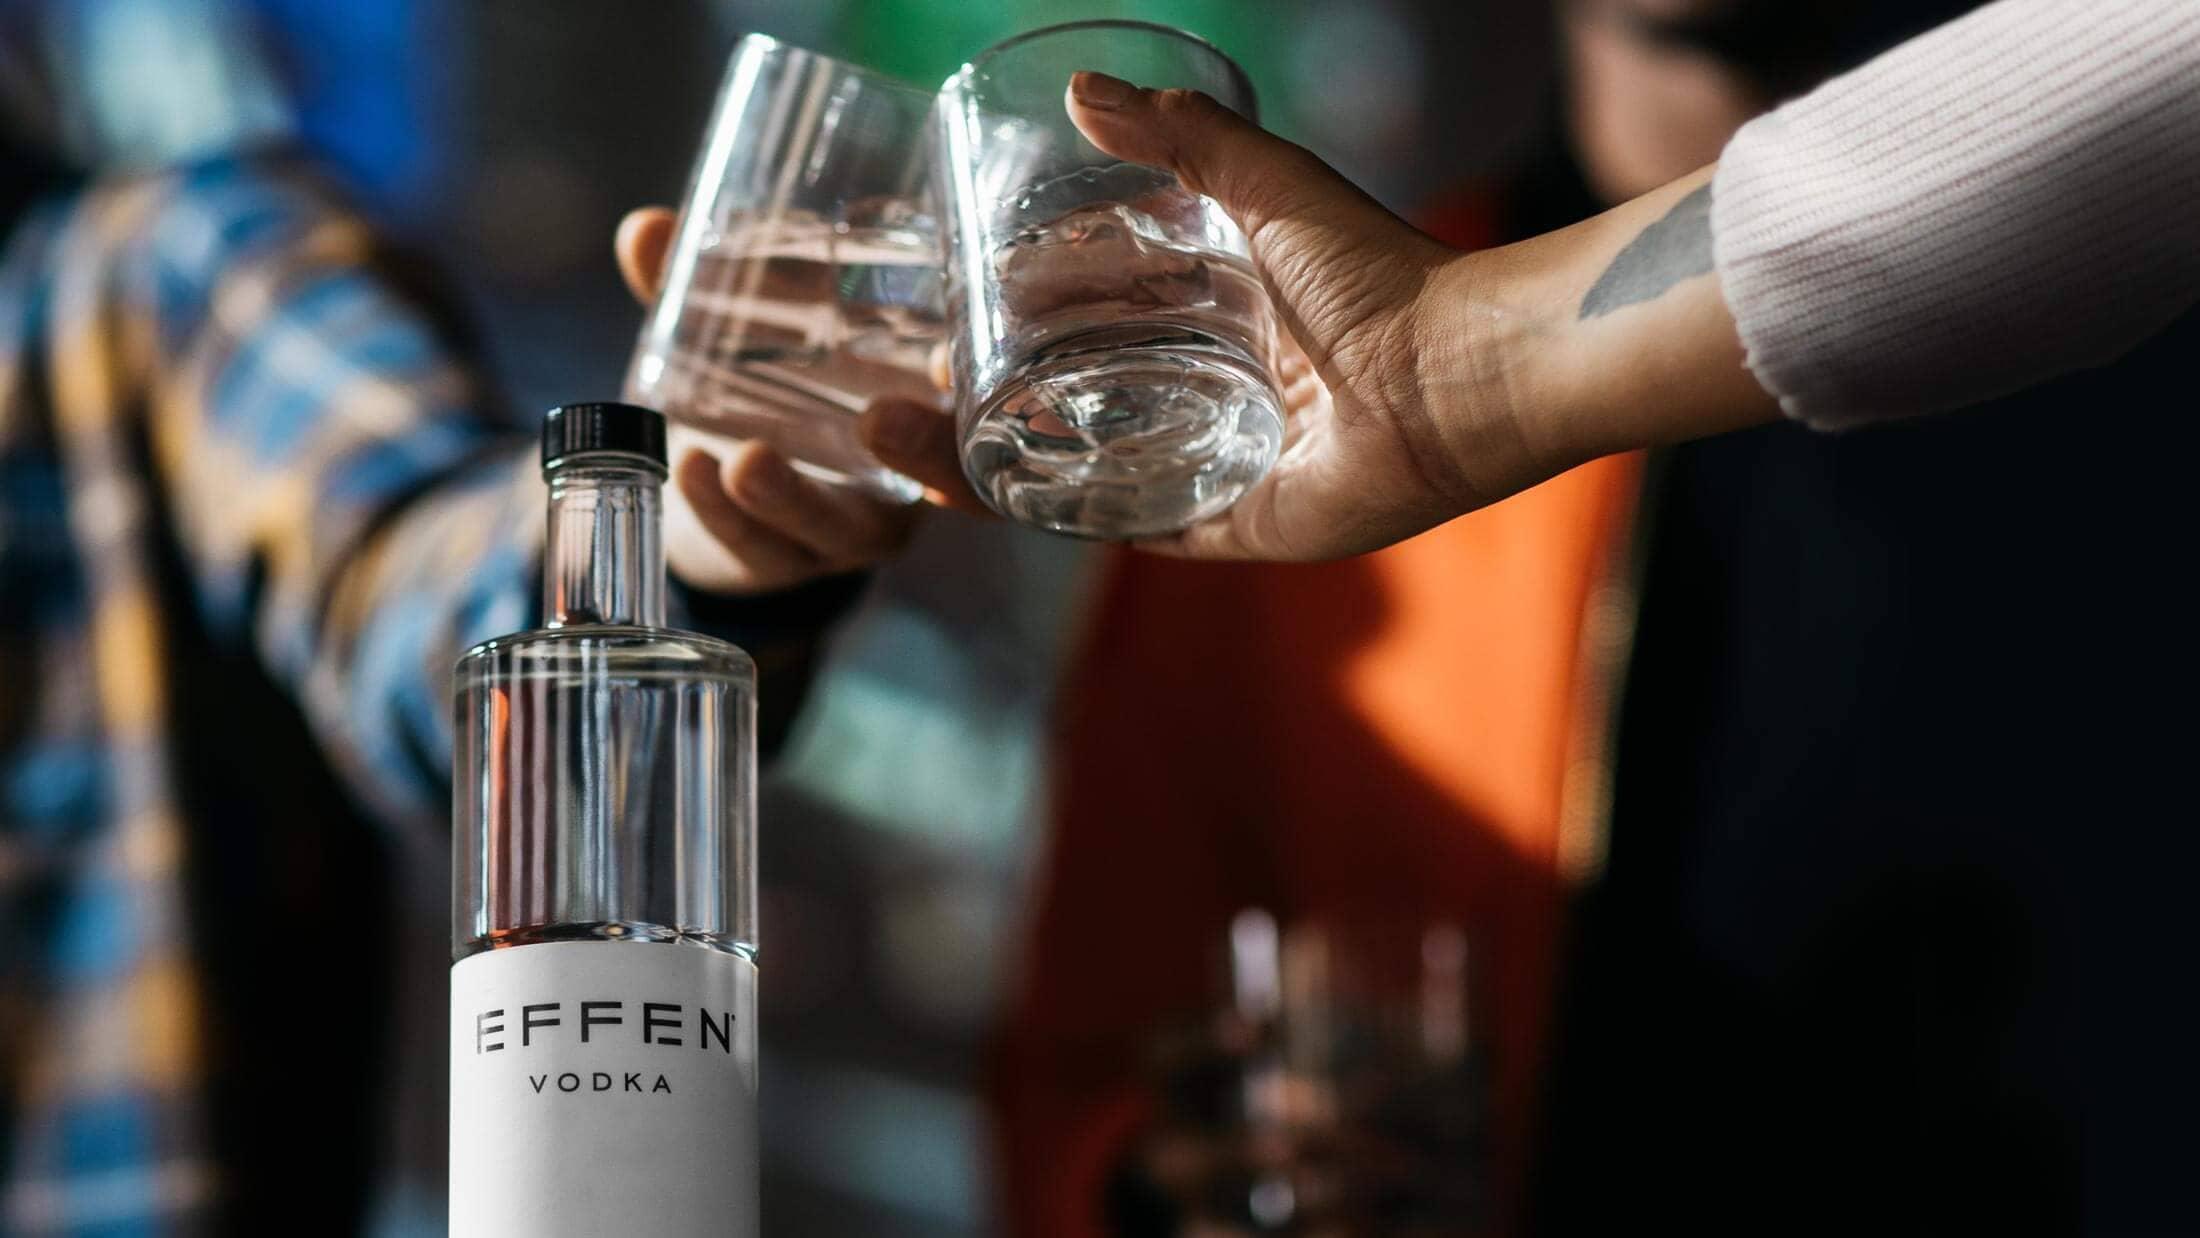 EFFEN is premium dutch vodka and unique premium design - just as unique as you.